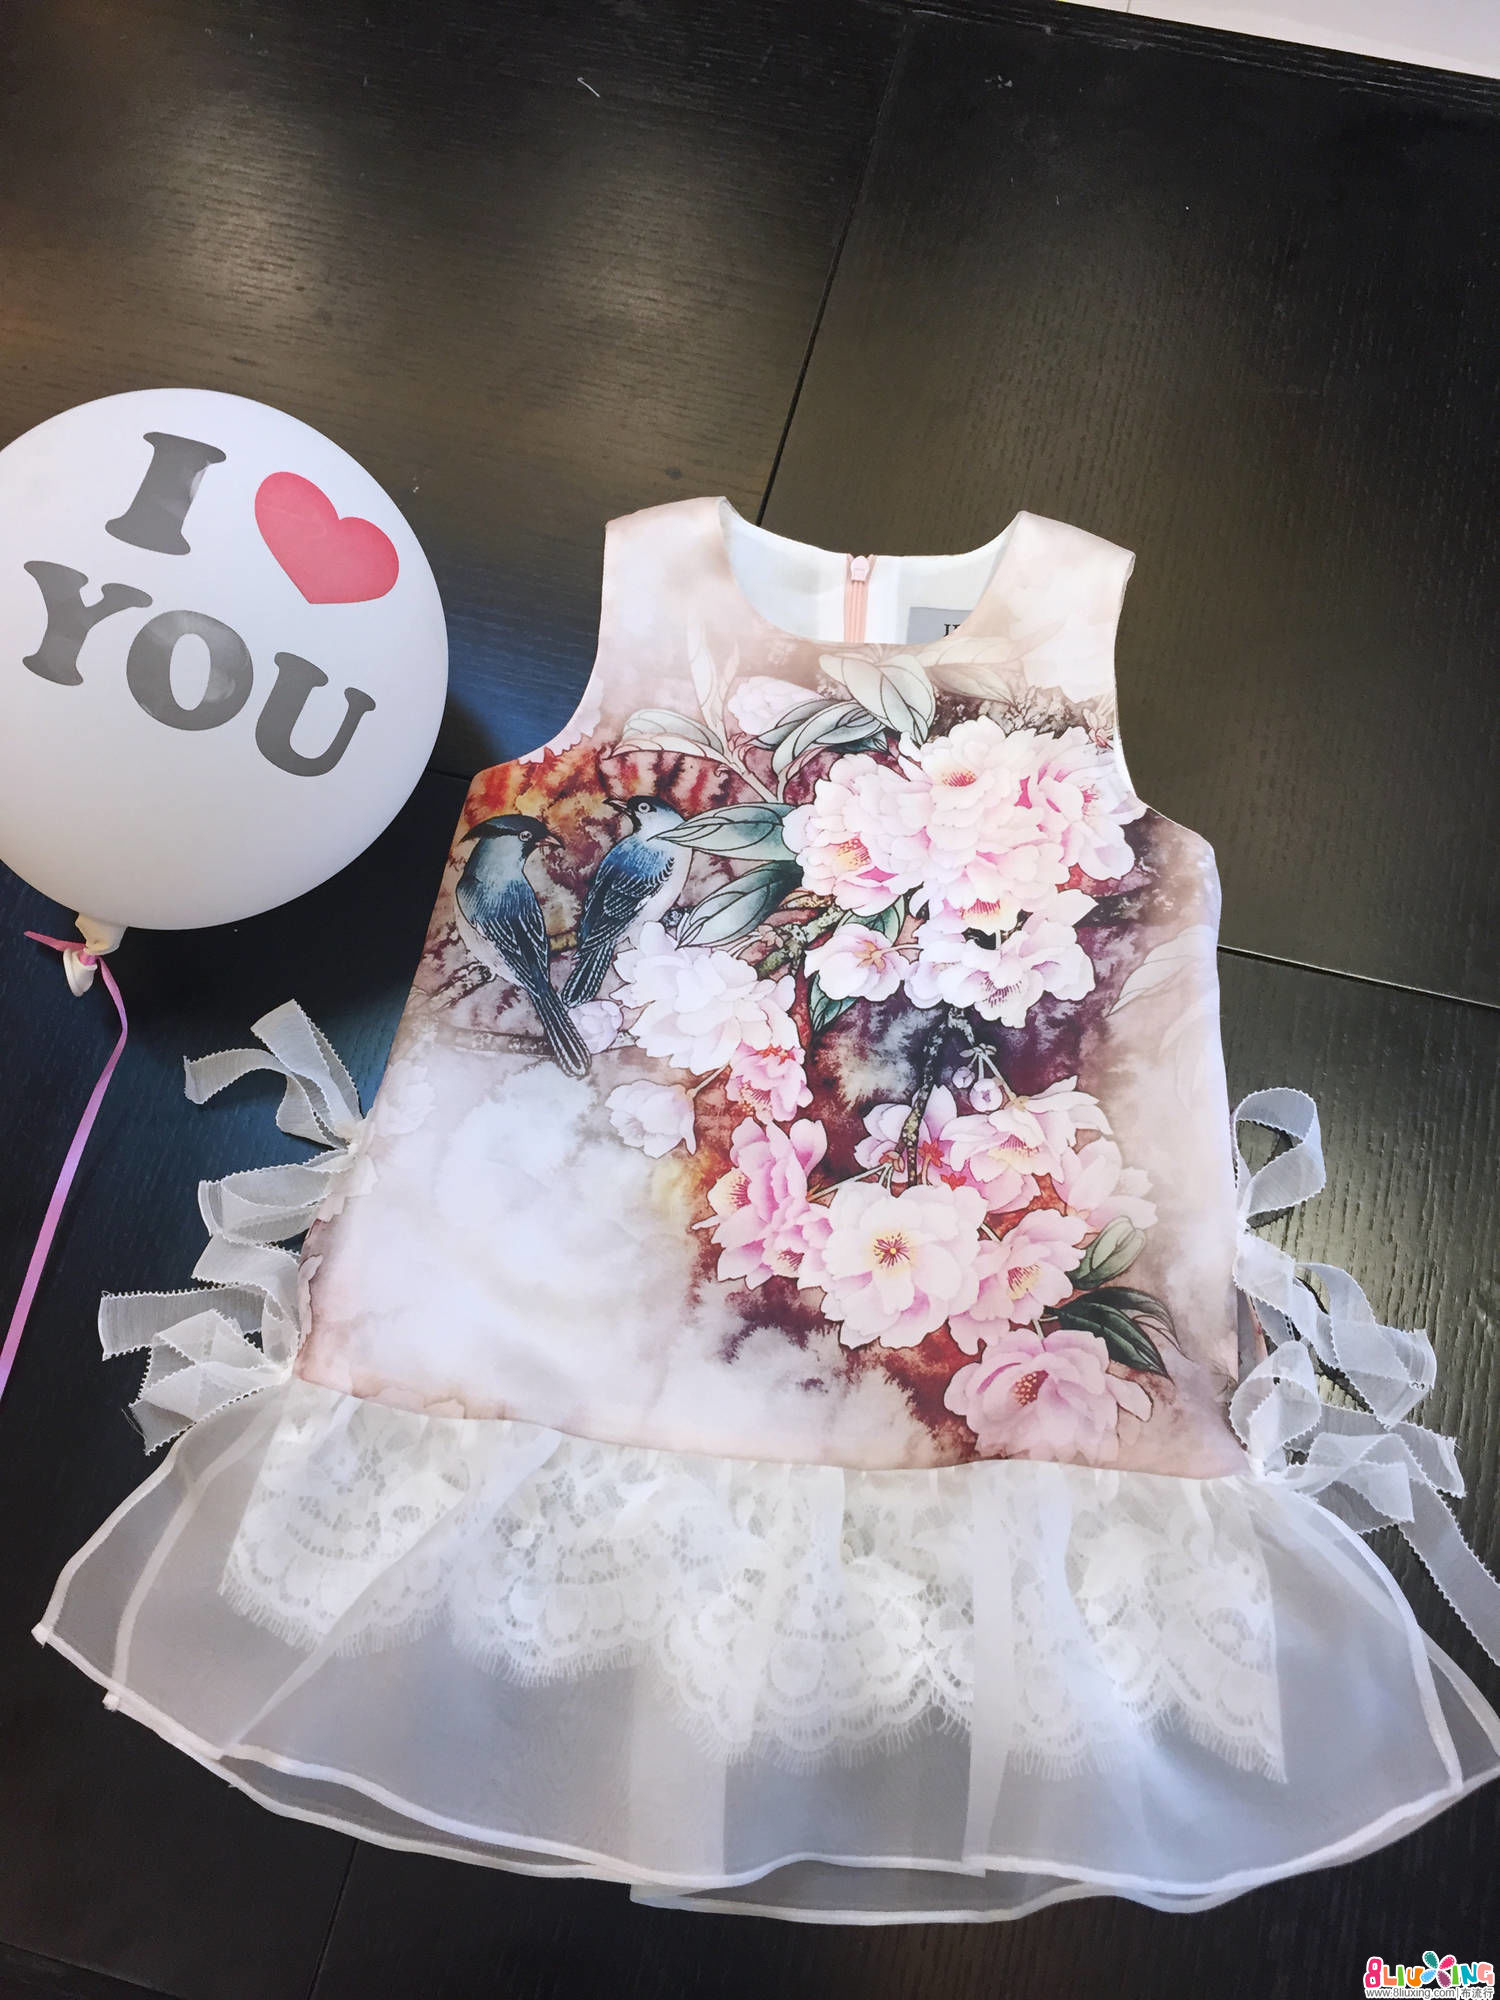 【Forider设计】hi~这么多美貌的小裙子,你最爱哪一款?